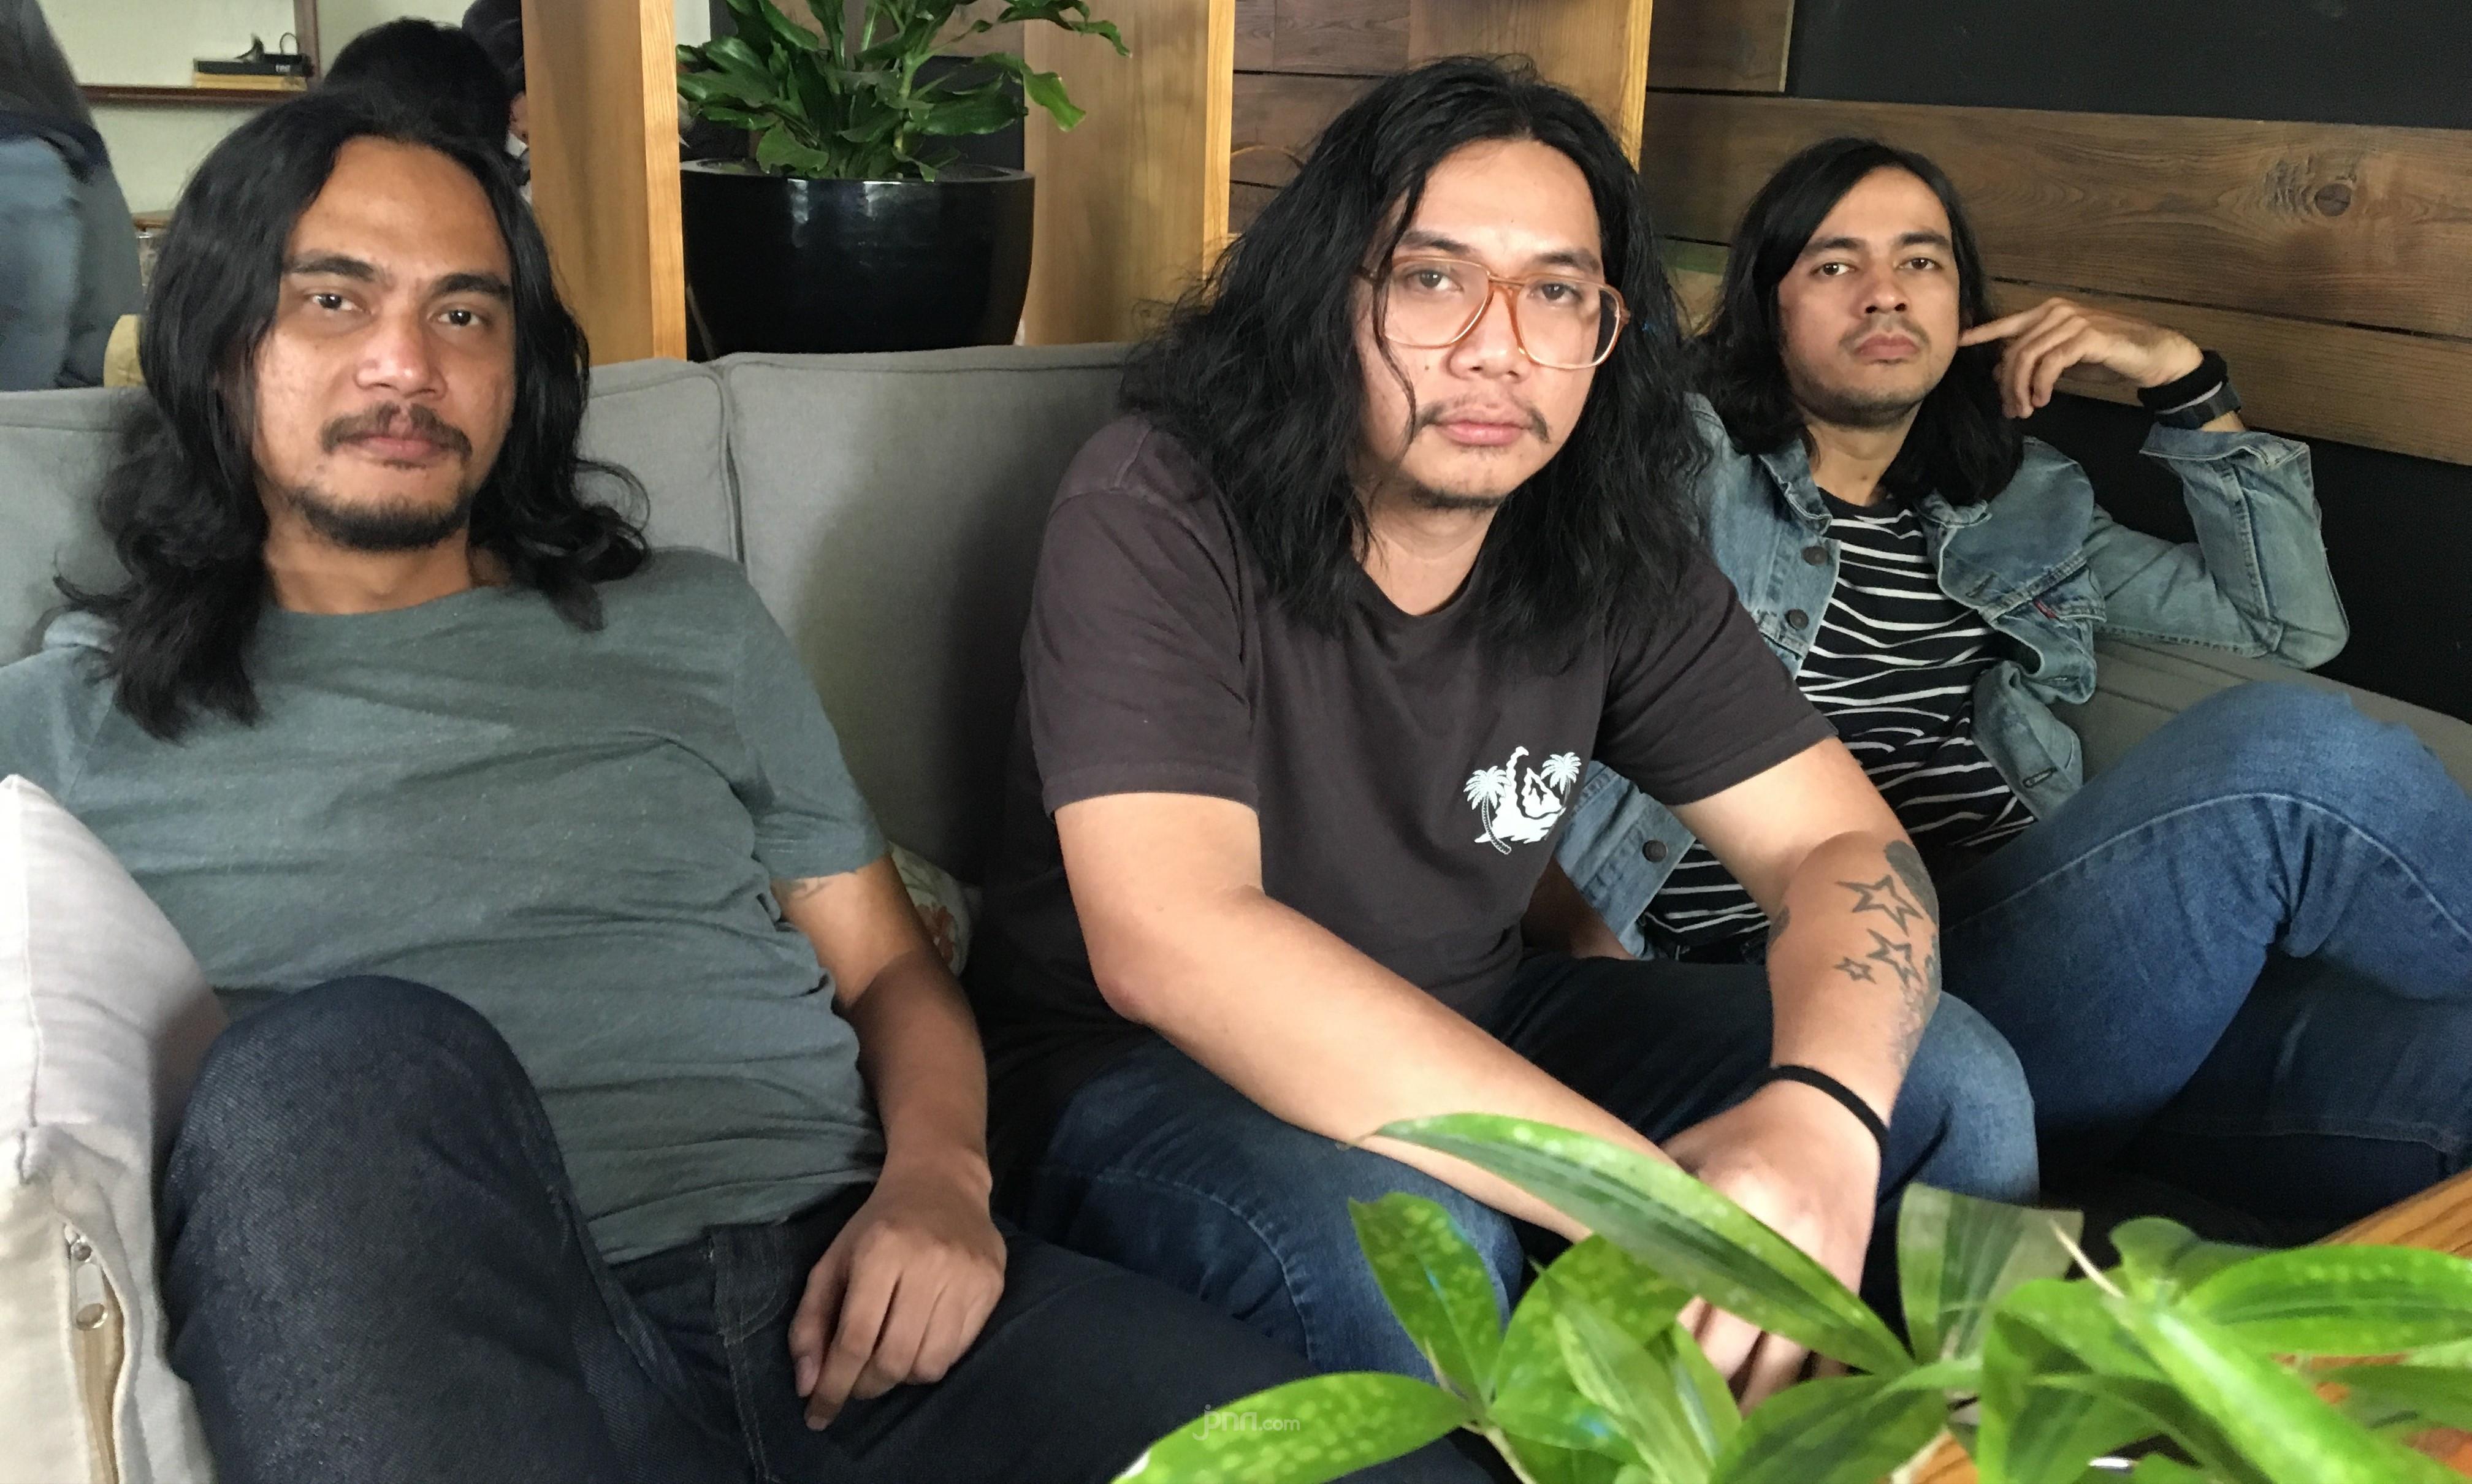 Kelompok Penerbang Roket Persembahkan 'Dikejar Setan' - JPNN.com